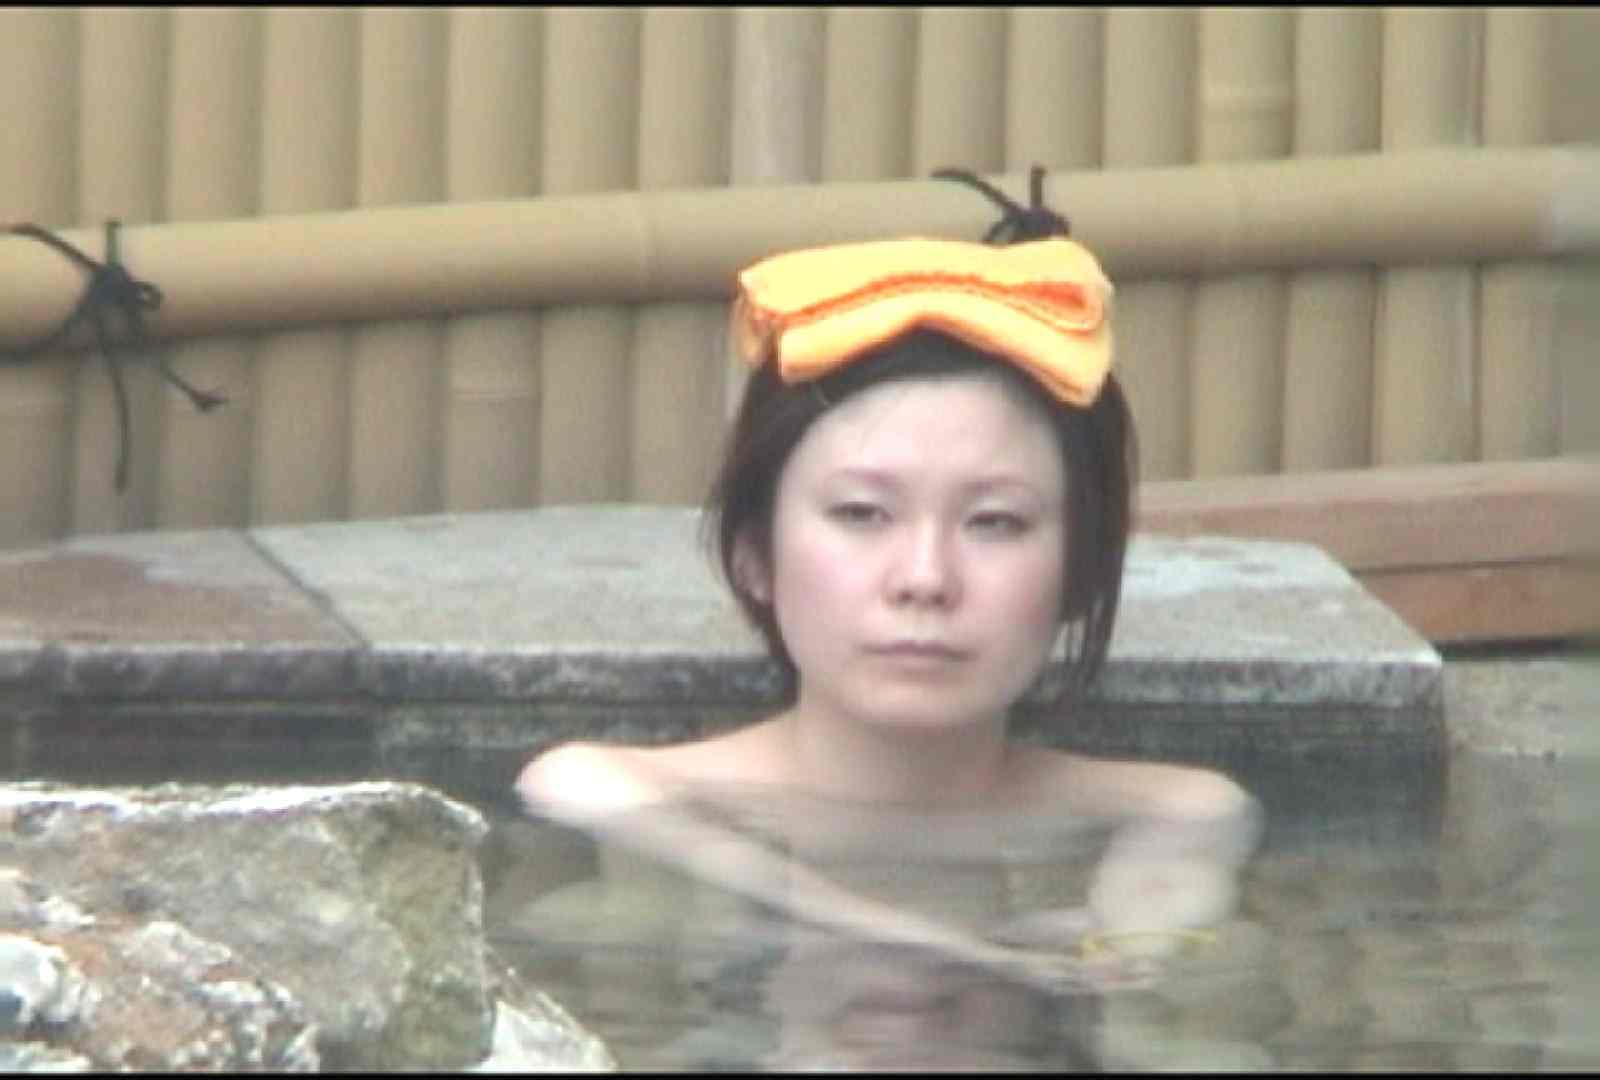 Aquaな露天風呂Vol.177 OLのエロ生活 オマンコ無修正動画無料 40連発 20